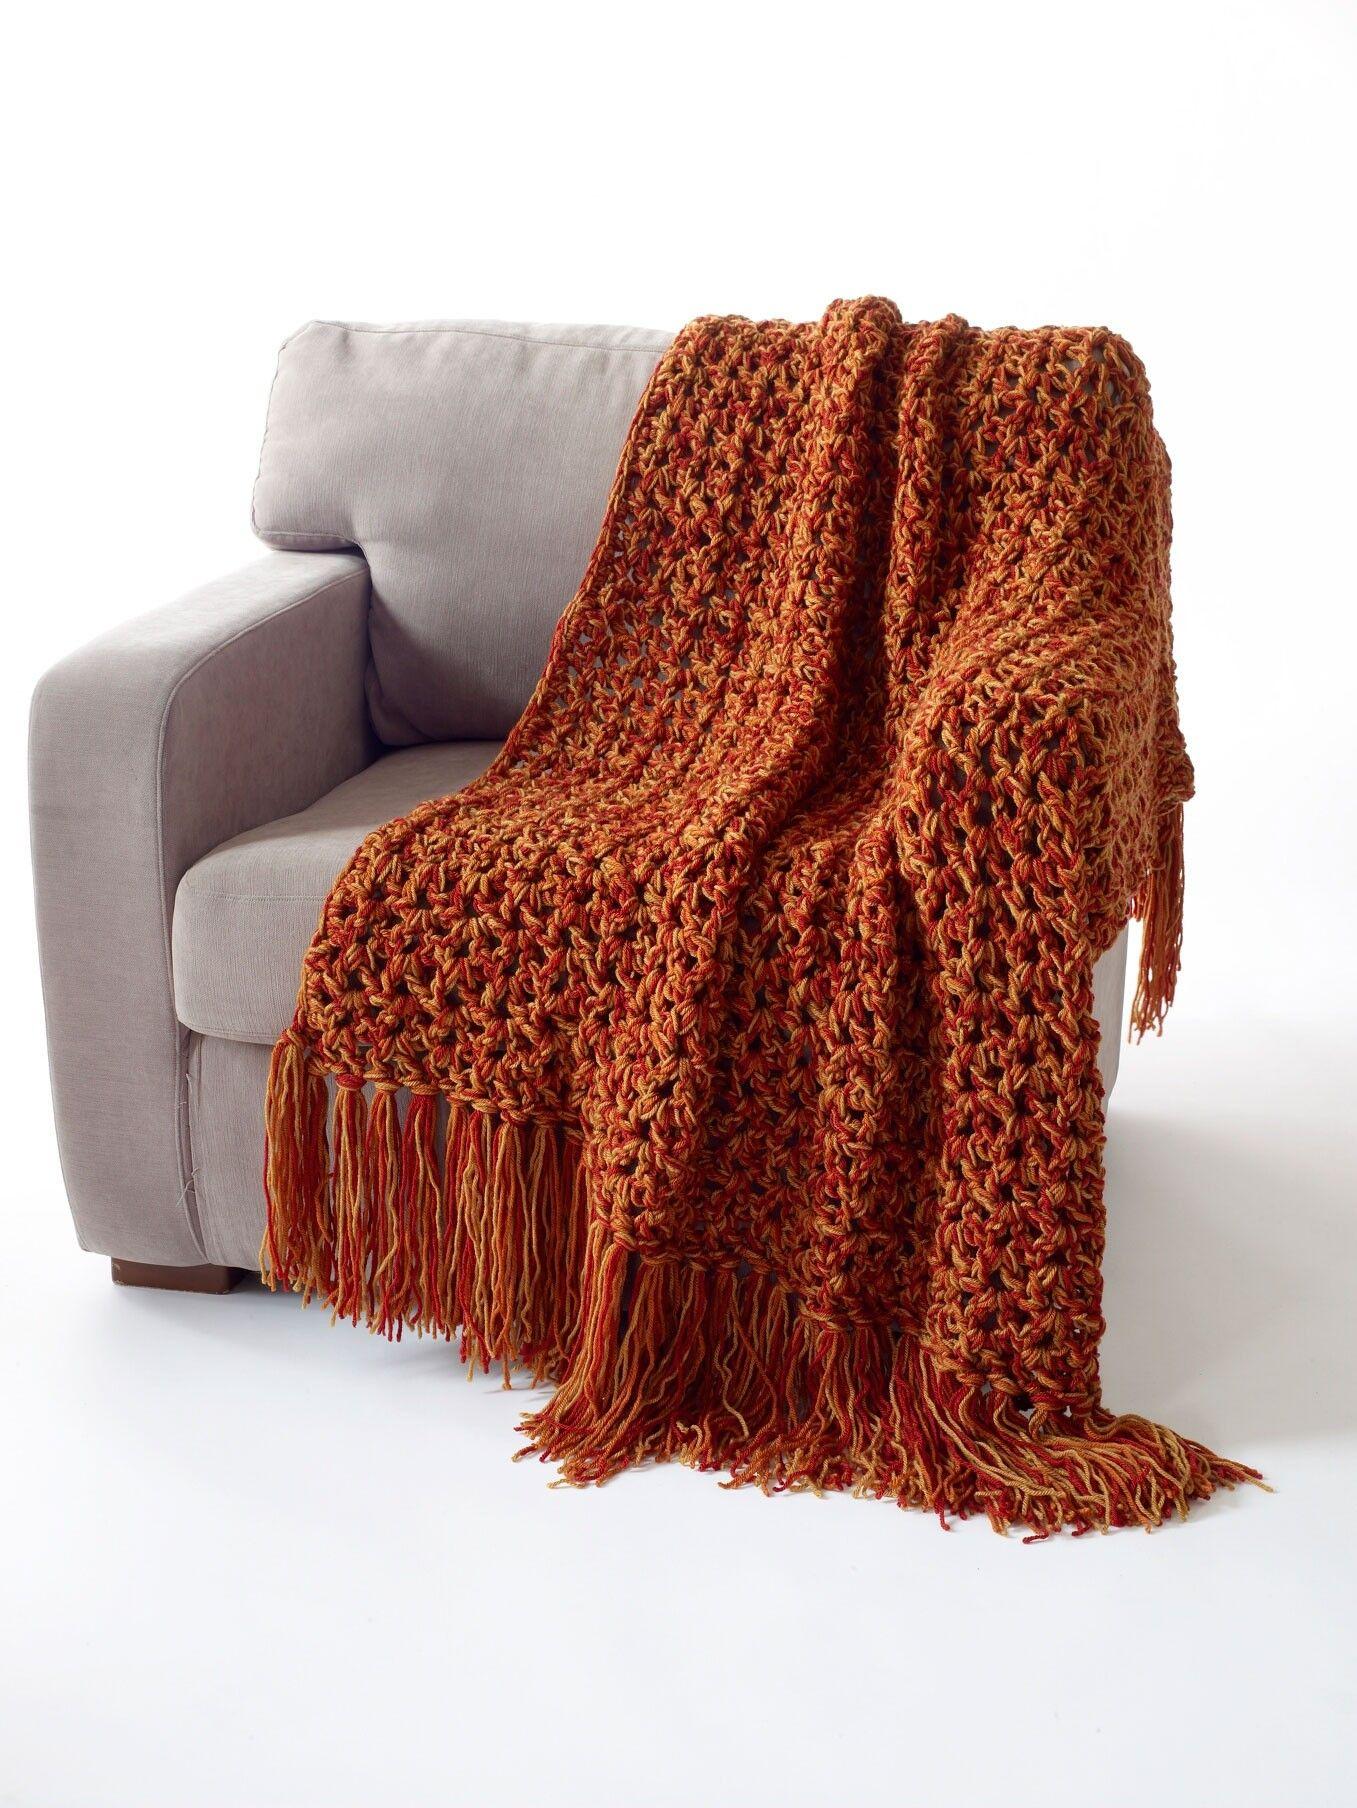 Tv lapghan pattern crochet crochet pinterest crochet tv lapghan pattern crochet bankloansurffo Gallery